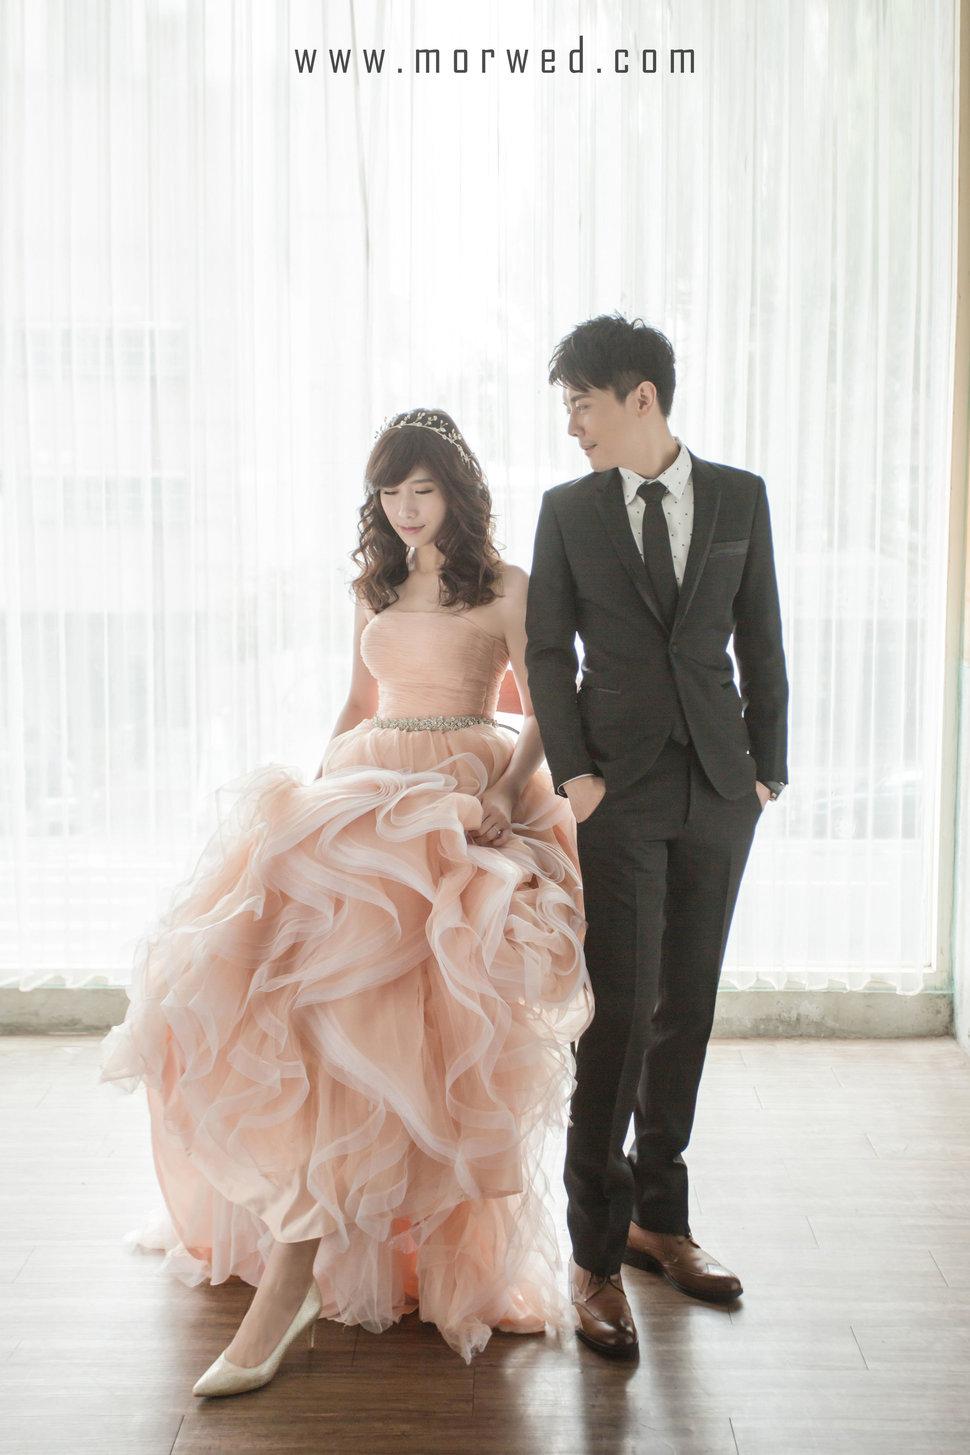 FEY_6640 - MOR 婚紗攝影工坊 - 結婚吧